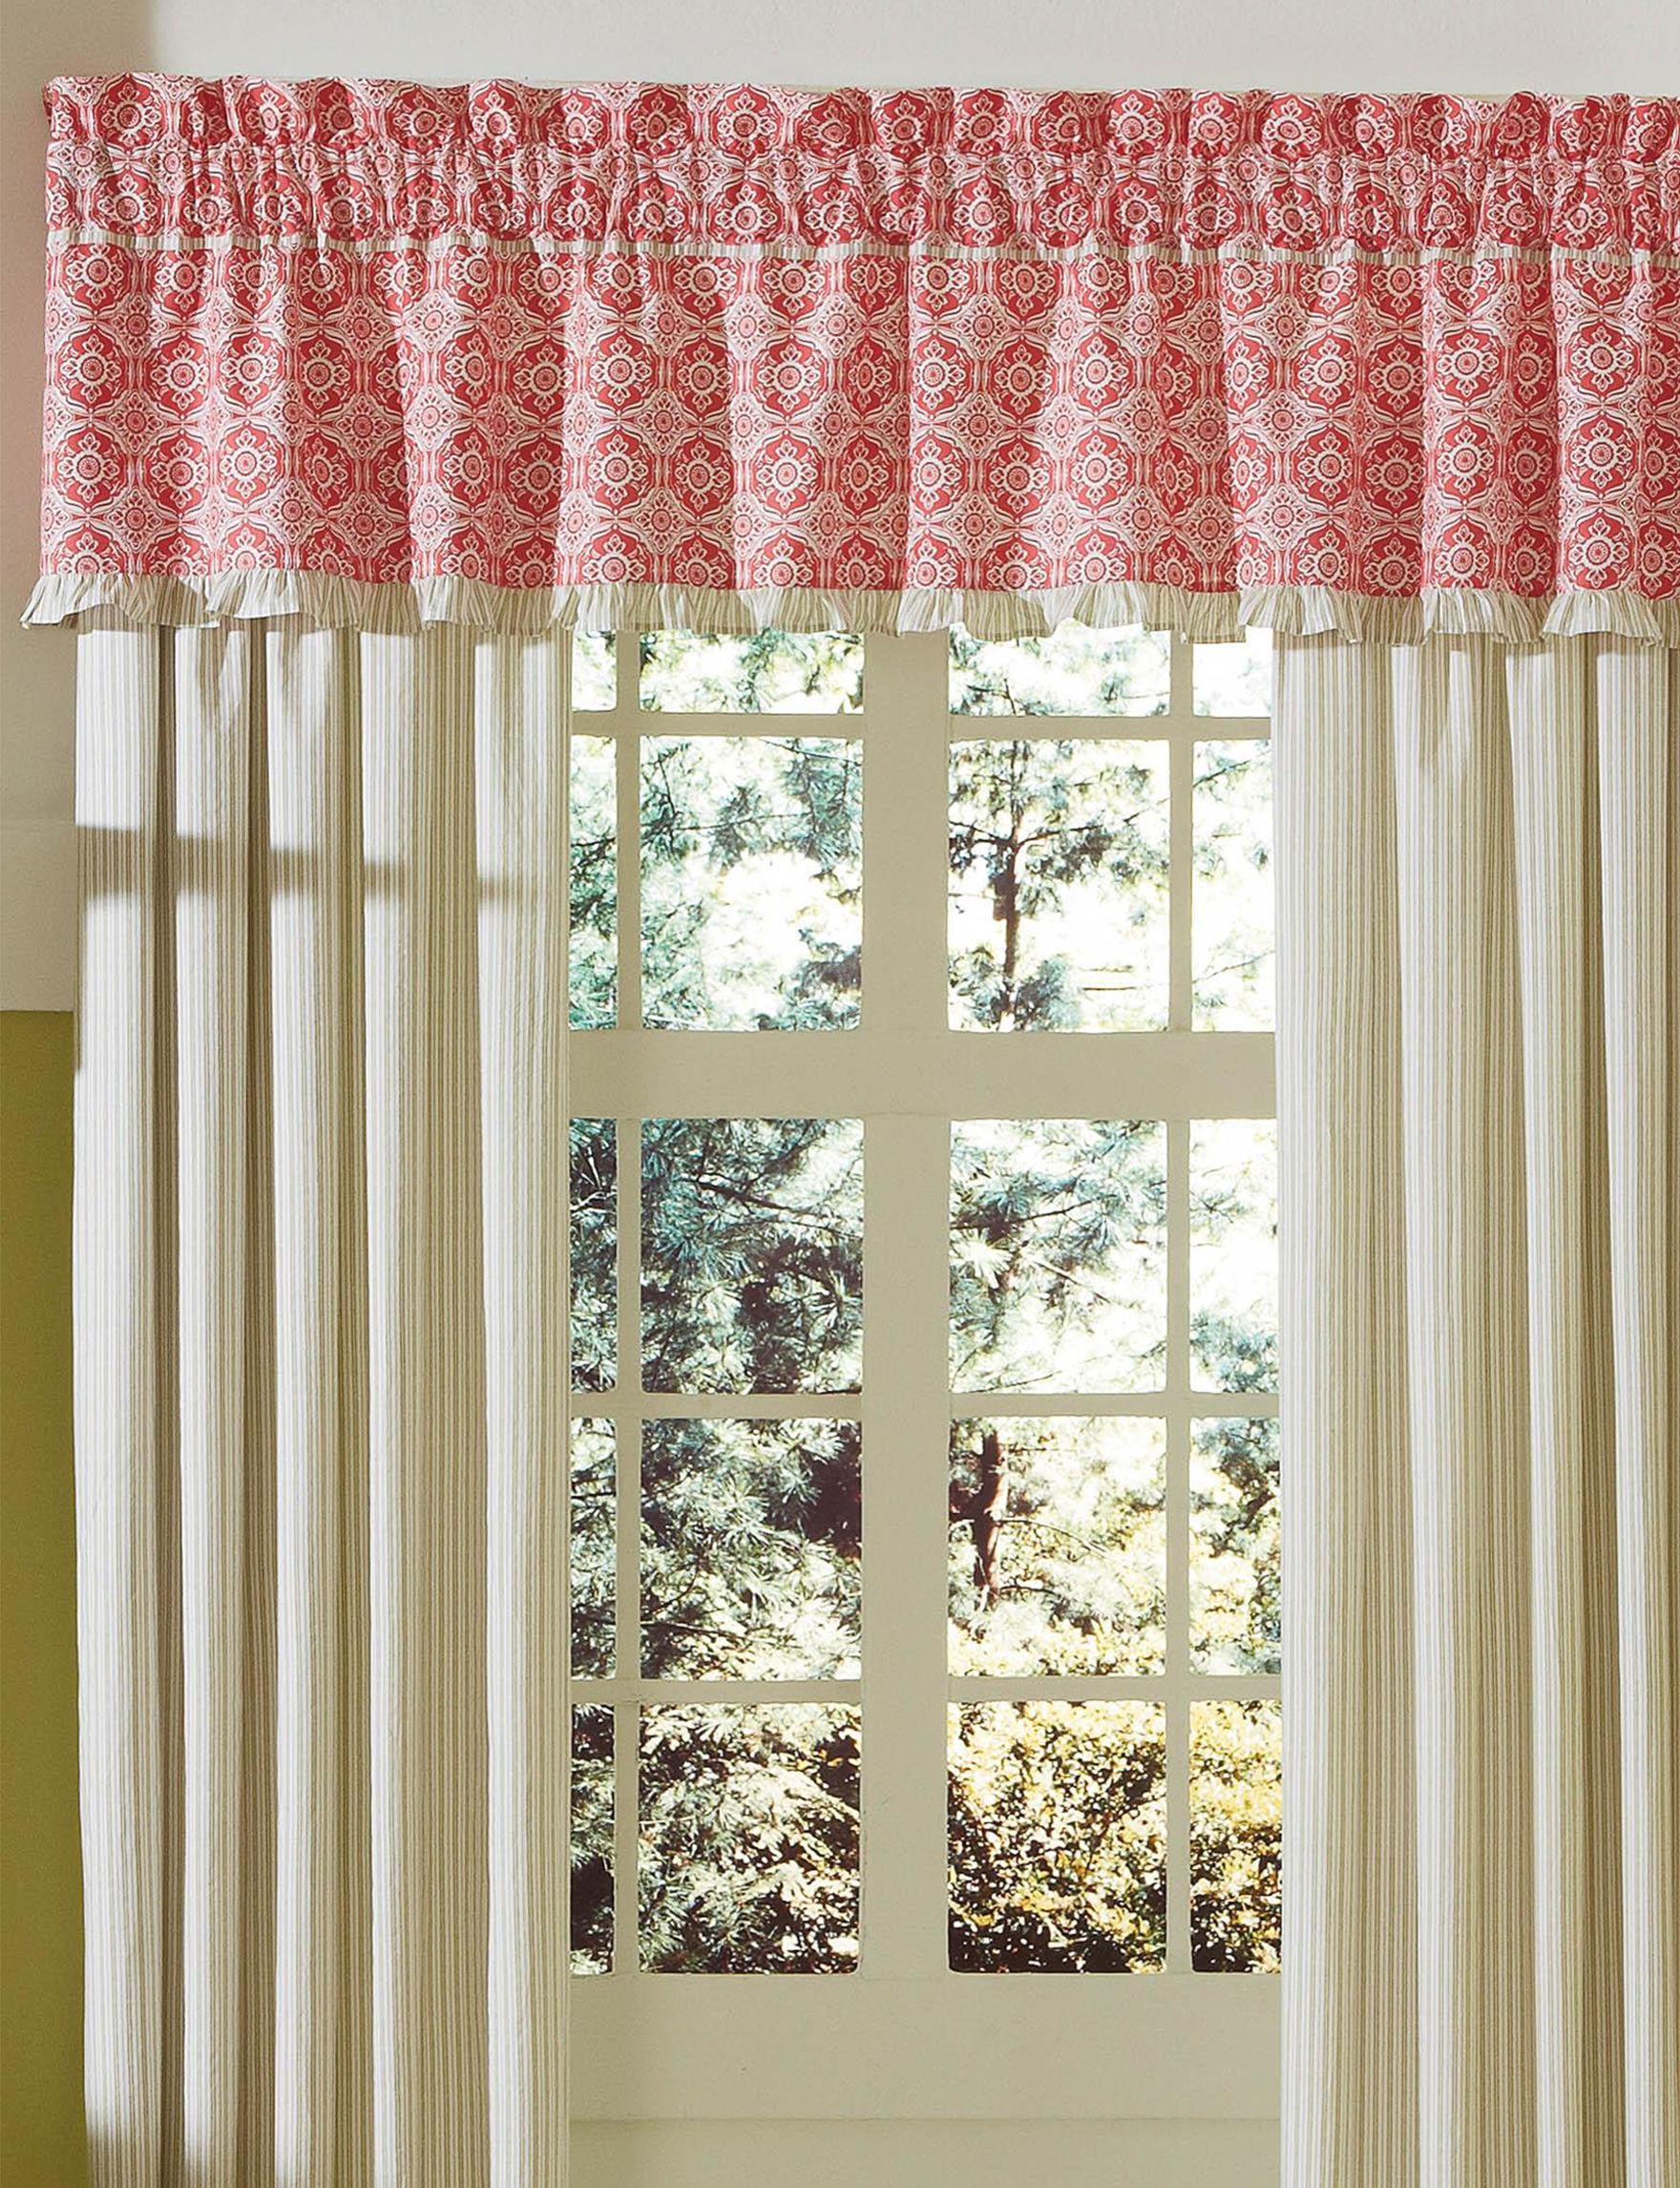 Mary Jane's Home Pink / White Valances Window Treatments